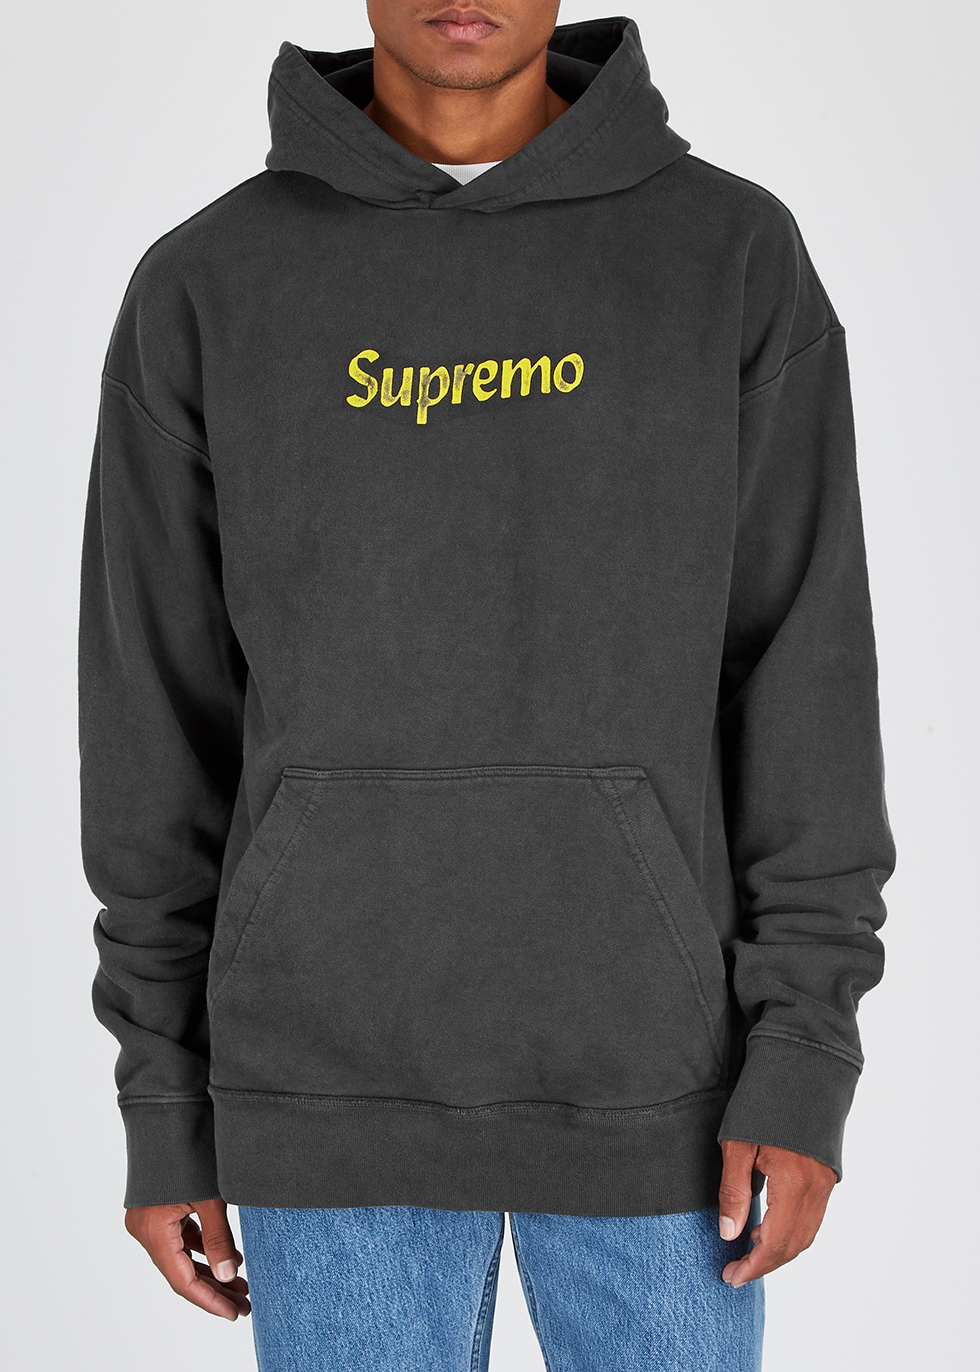 Supremo printed cotton sweatshirt - RHUDE